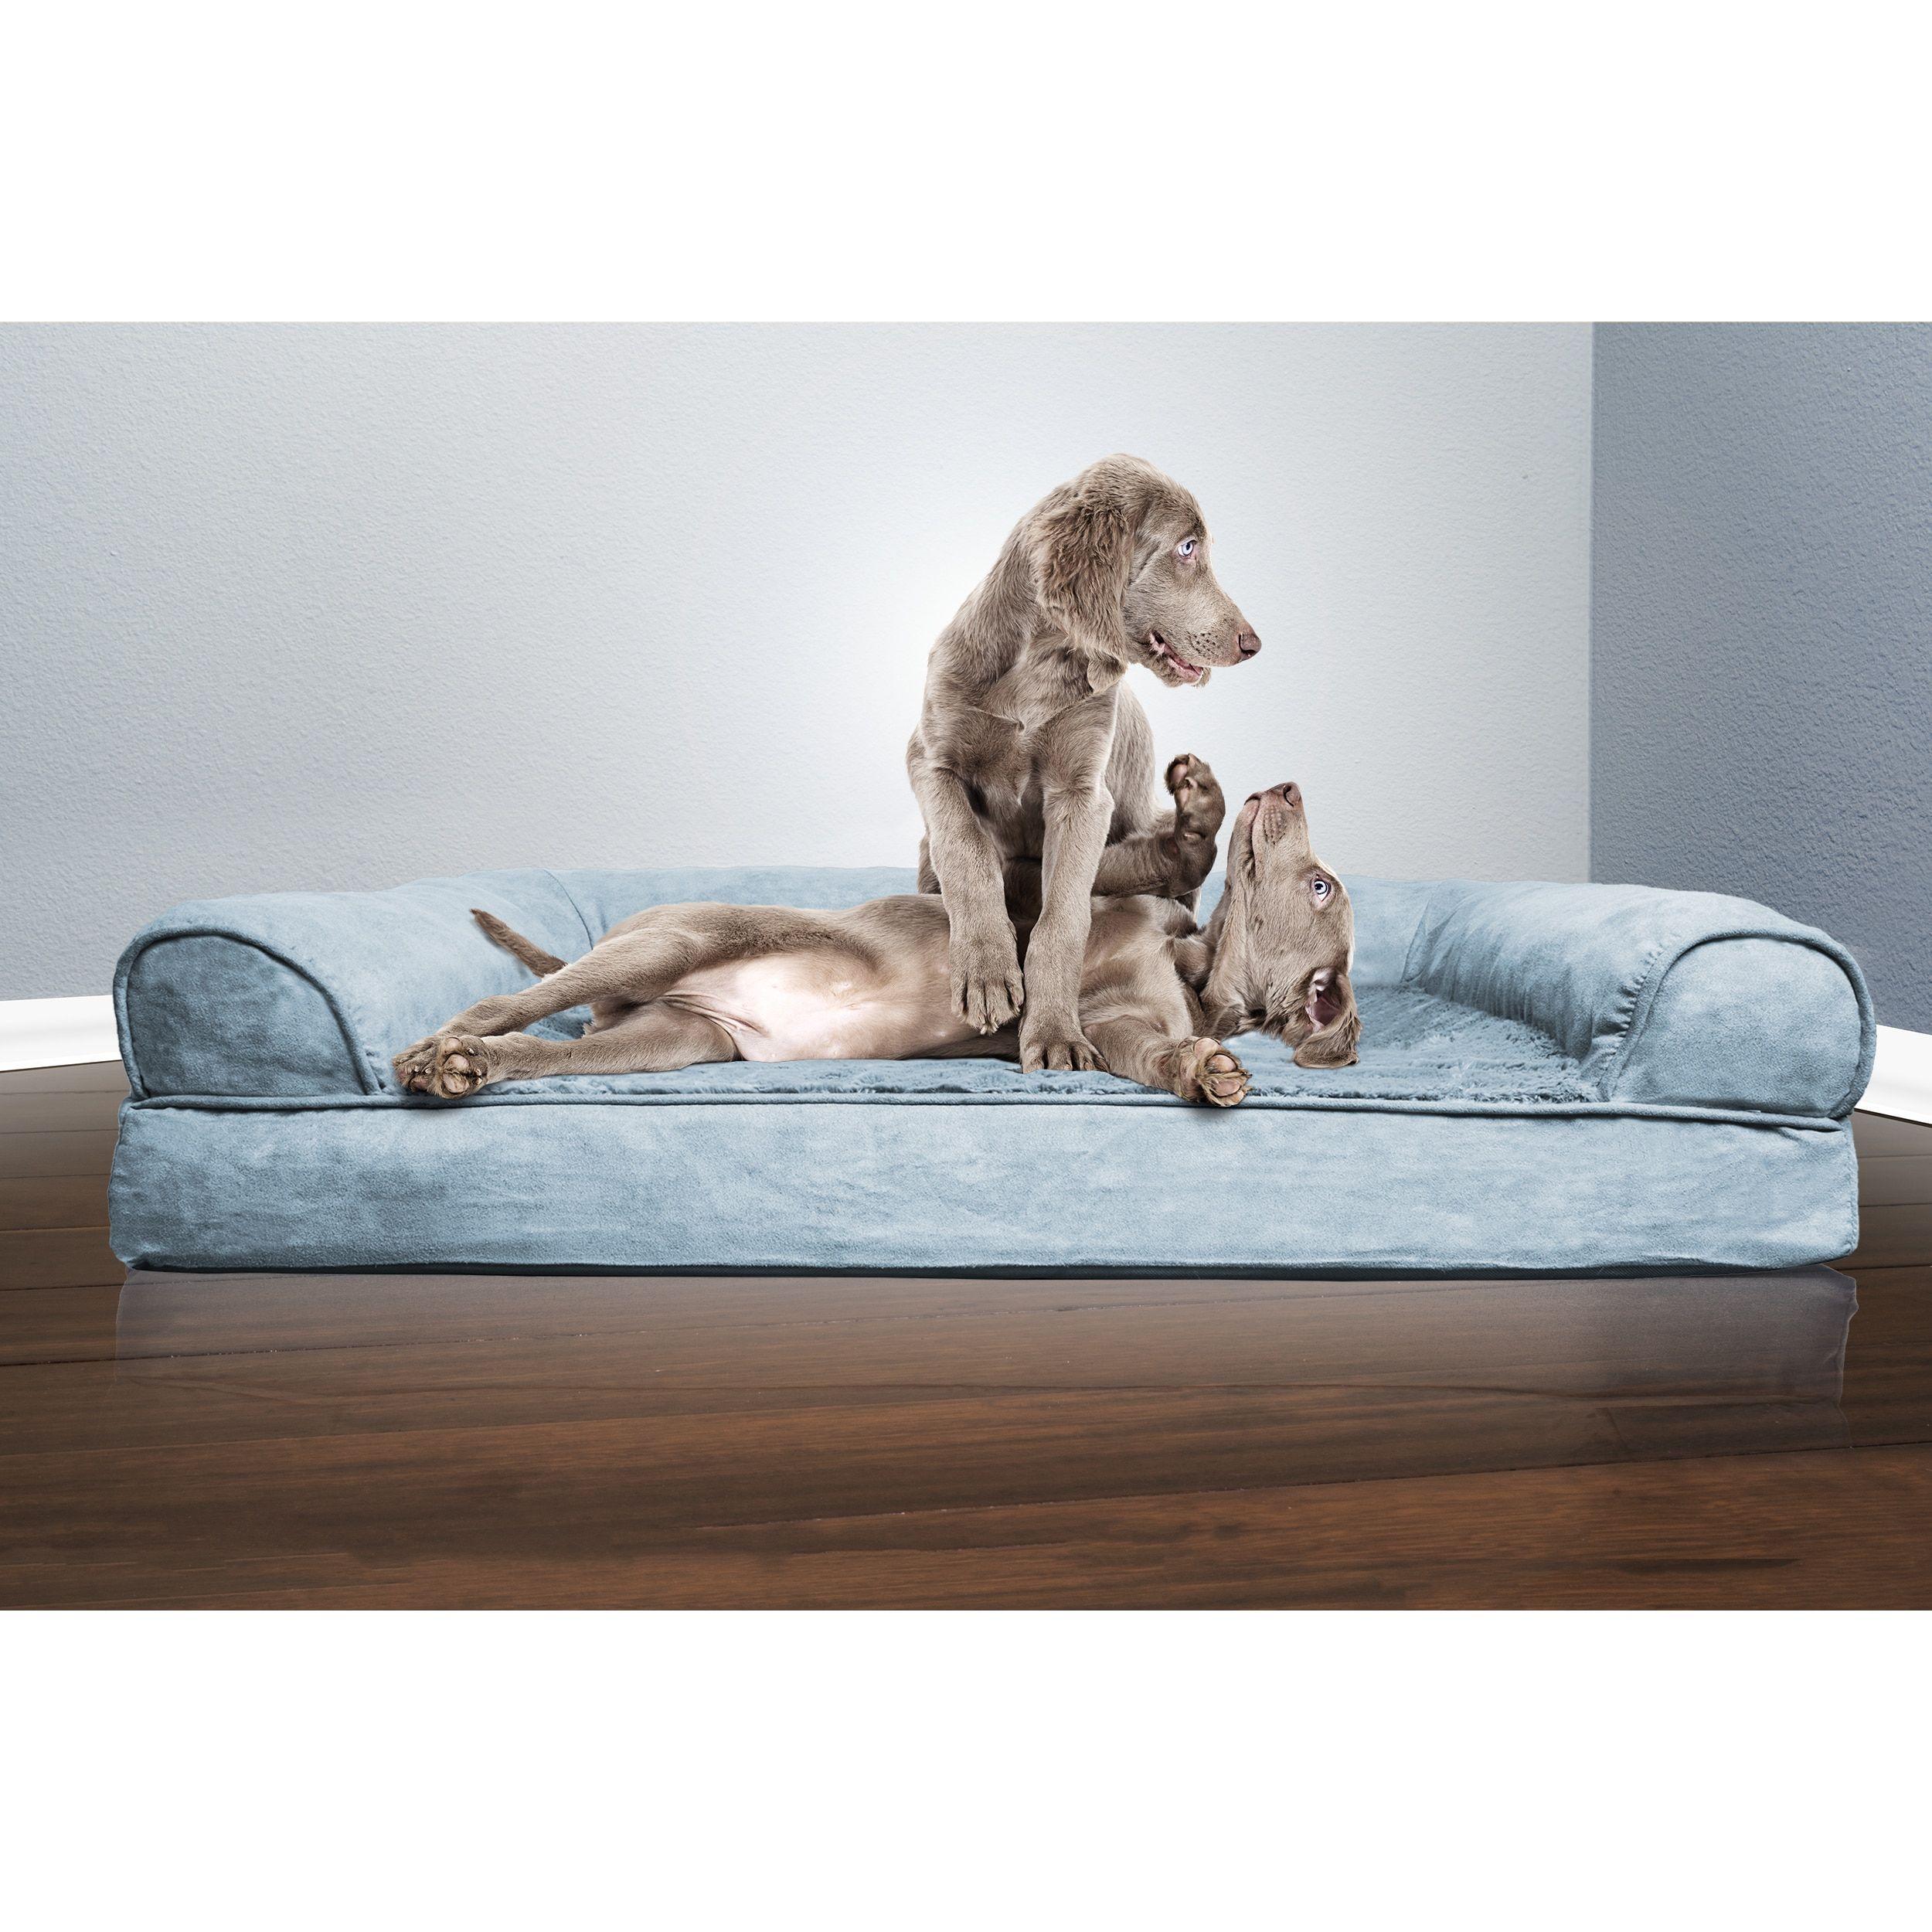 FurHaven Plush & Suede SofaStyle Orthopedic Bolster Pet